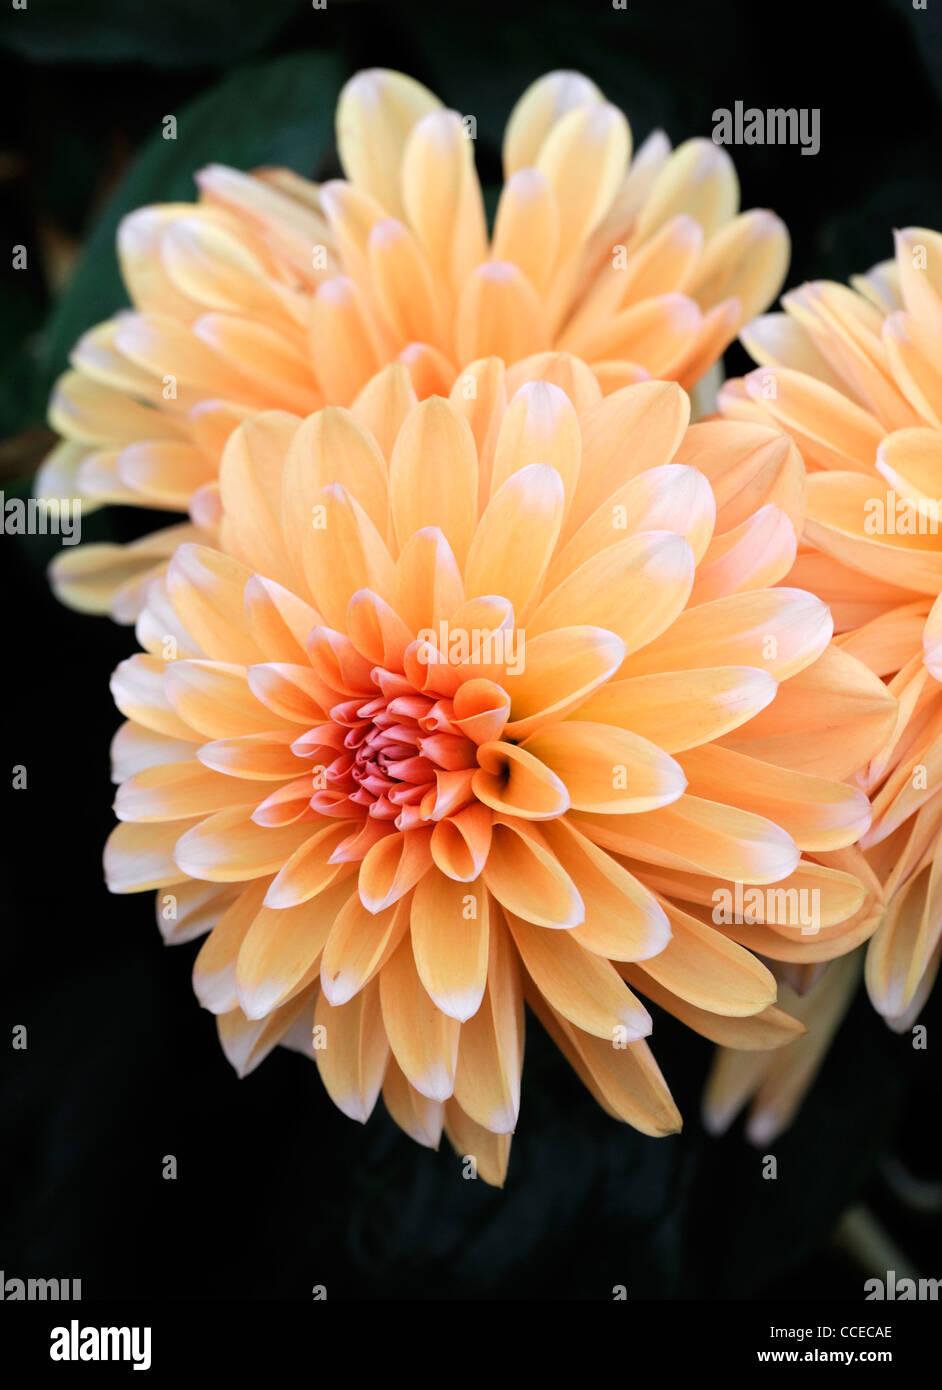 Dahlia anne elise orange flower bloom blossom closeup plant portraits flowers flowering perennials blooms blossoms - Stock Image